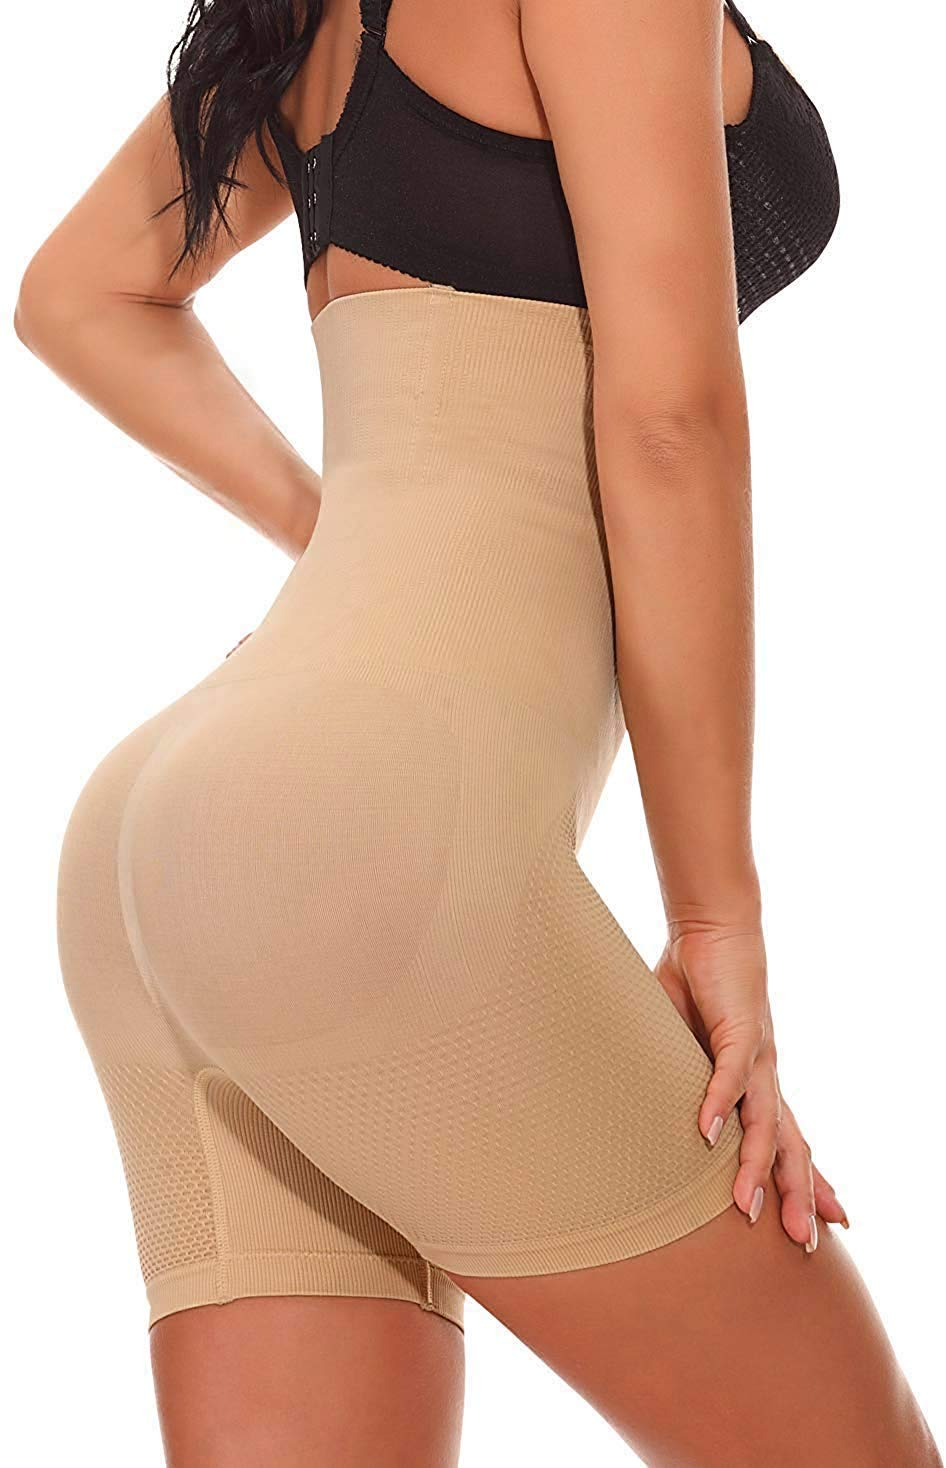 Larry&Marry Women Body Shaper Seamless Butt Lifter Shapewear Hi-Waist Waist Trainer Tummy Control Panty